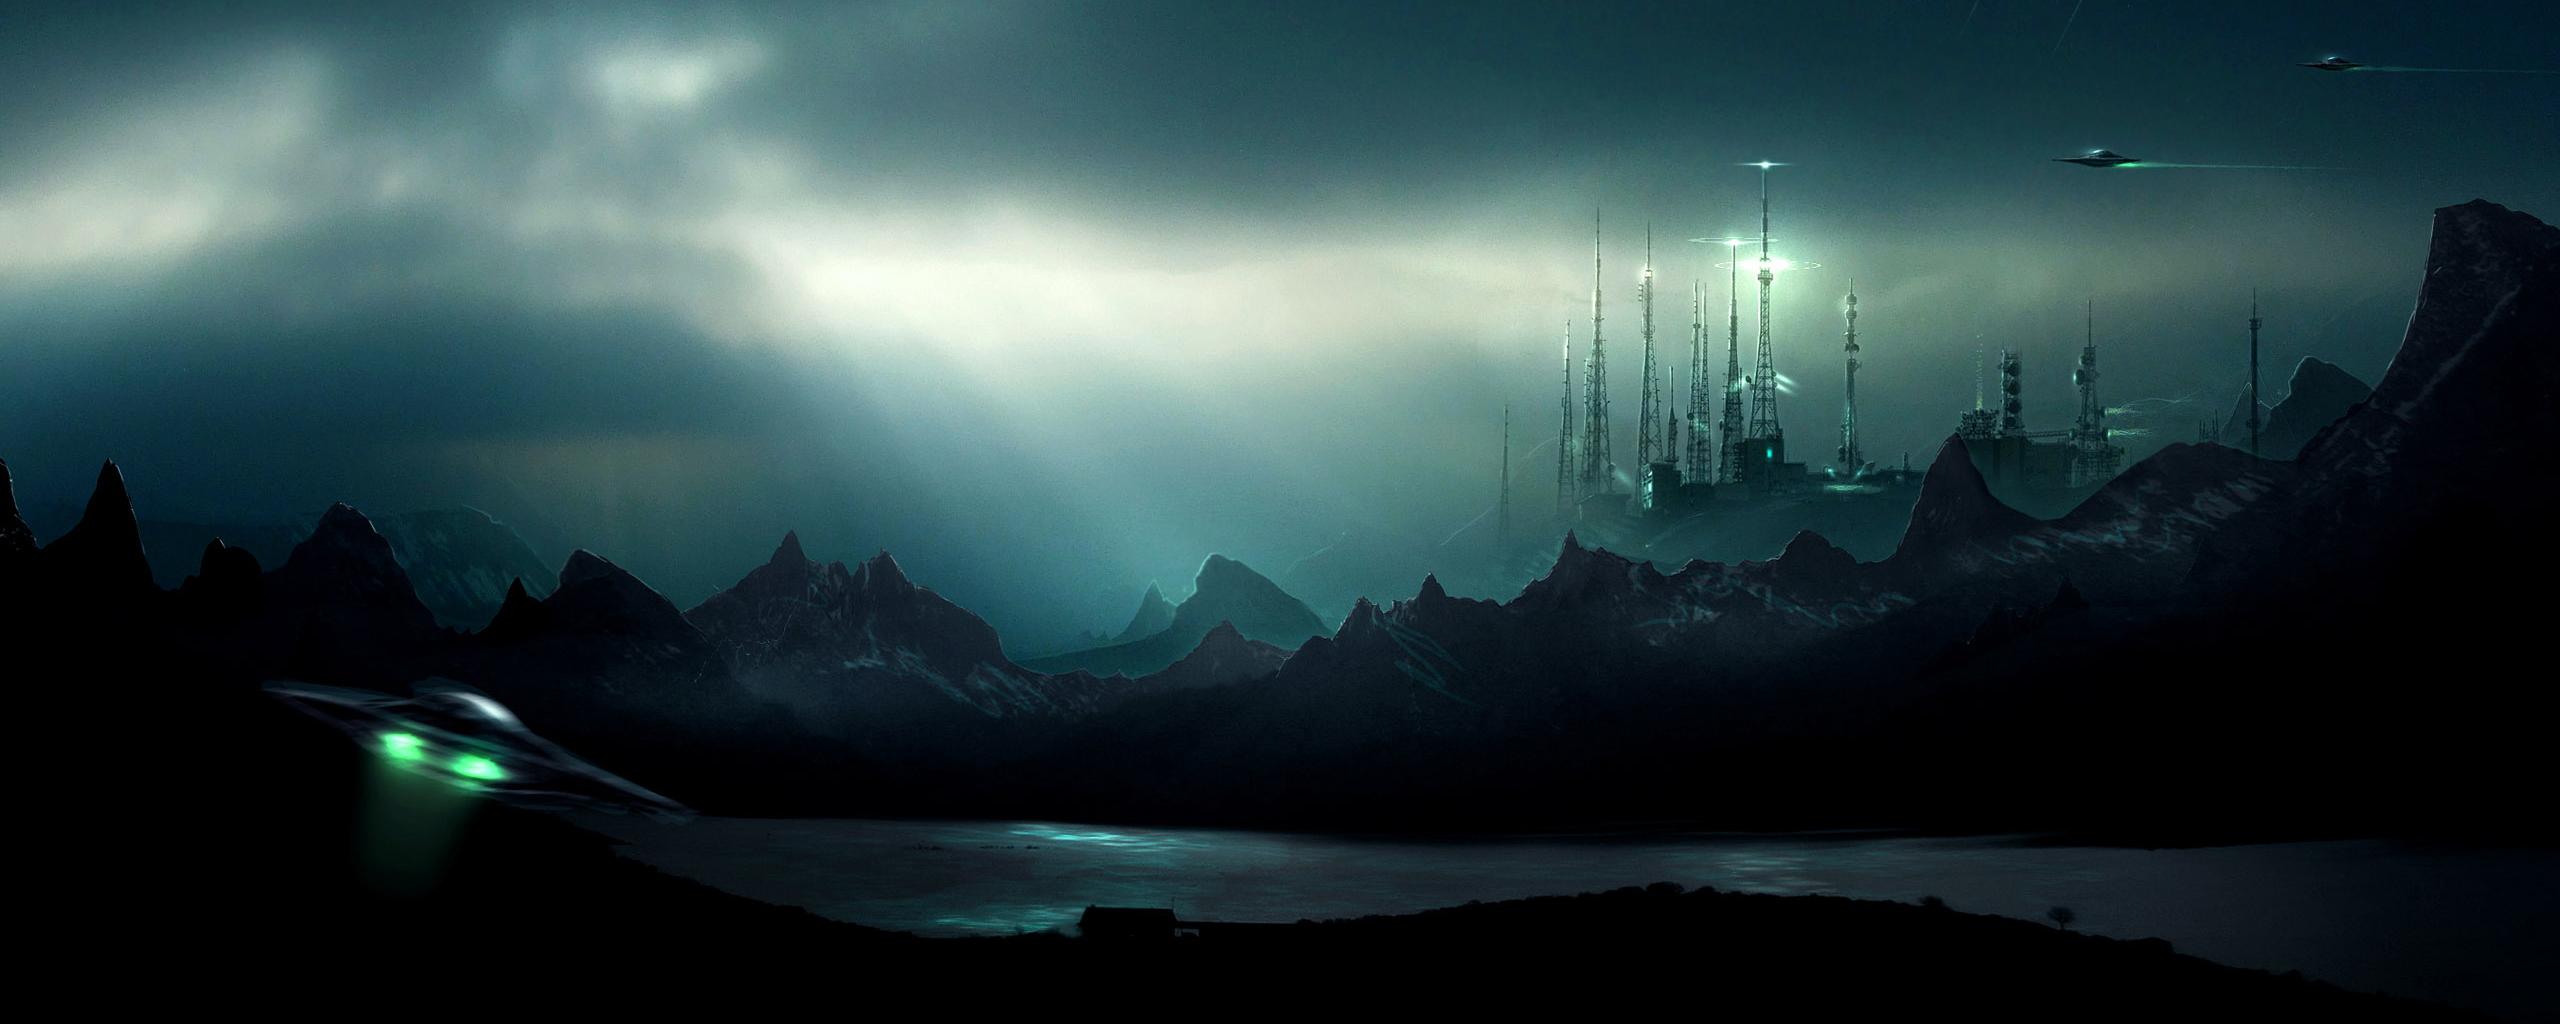 Homepage Panoramic Wallpapers Panoramic wallpaper 2560x1024 8 2560x1024